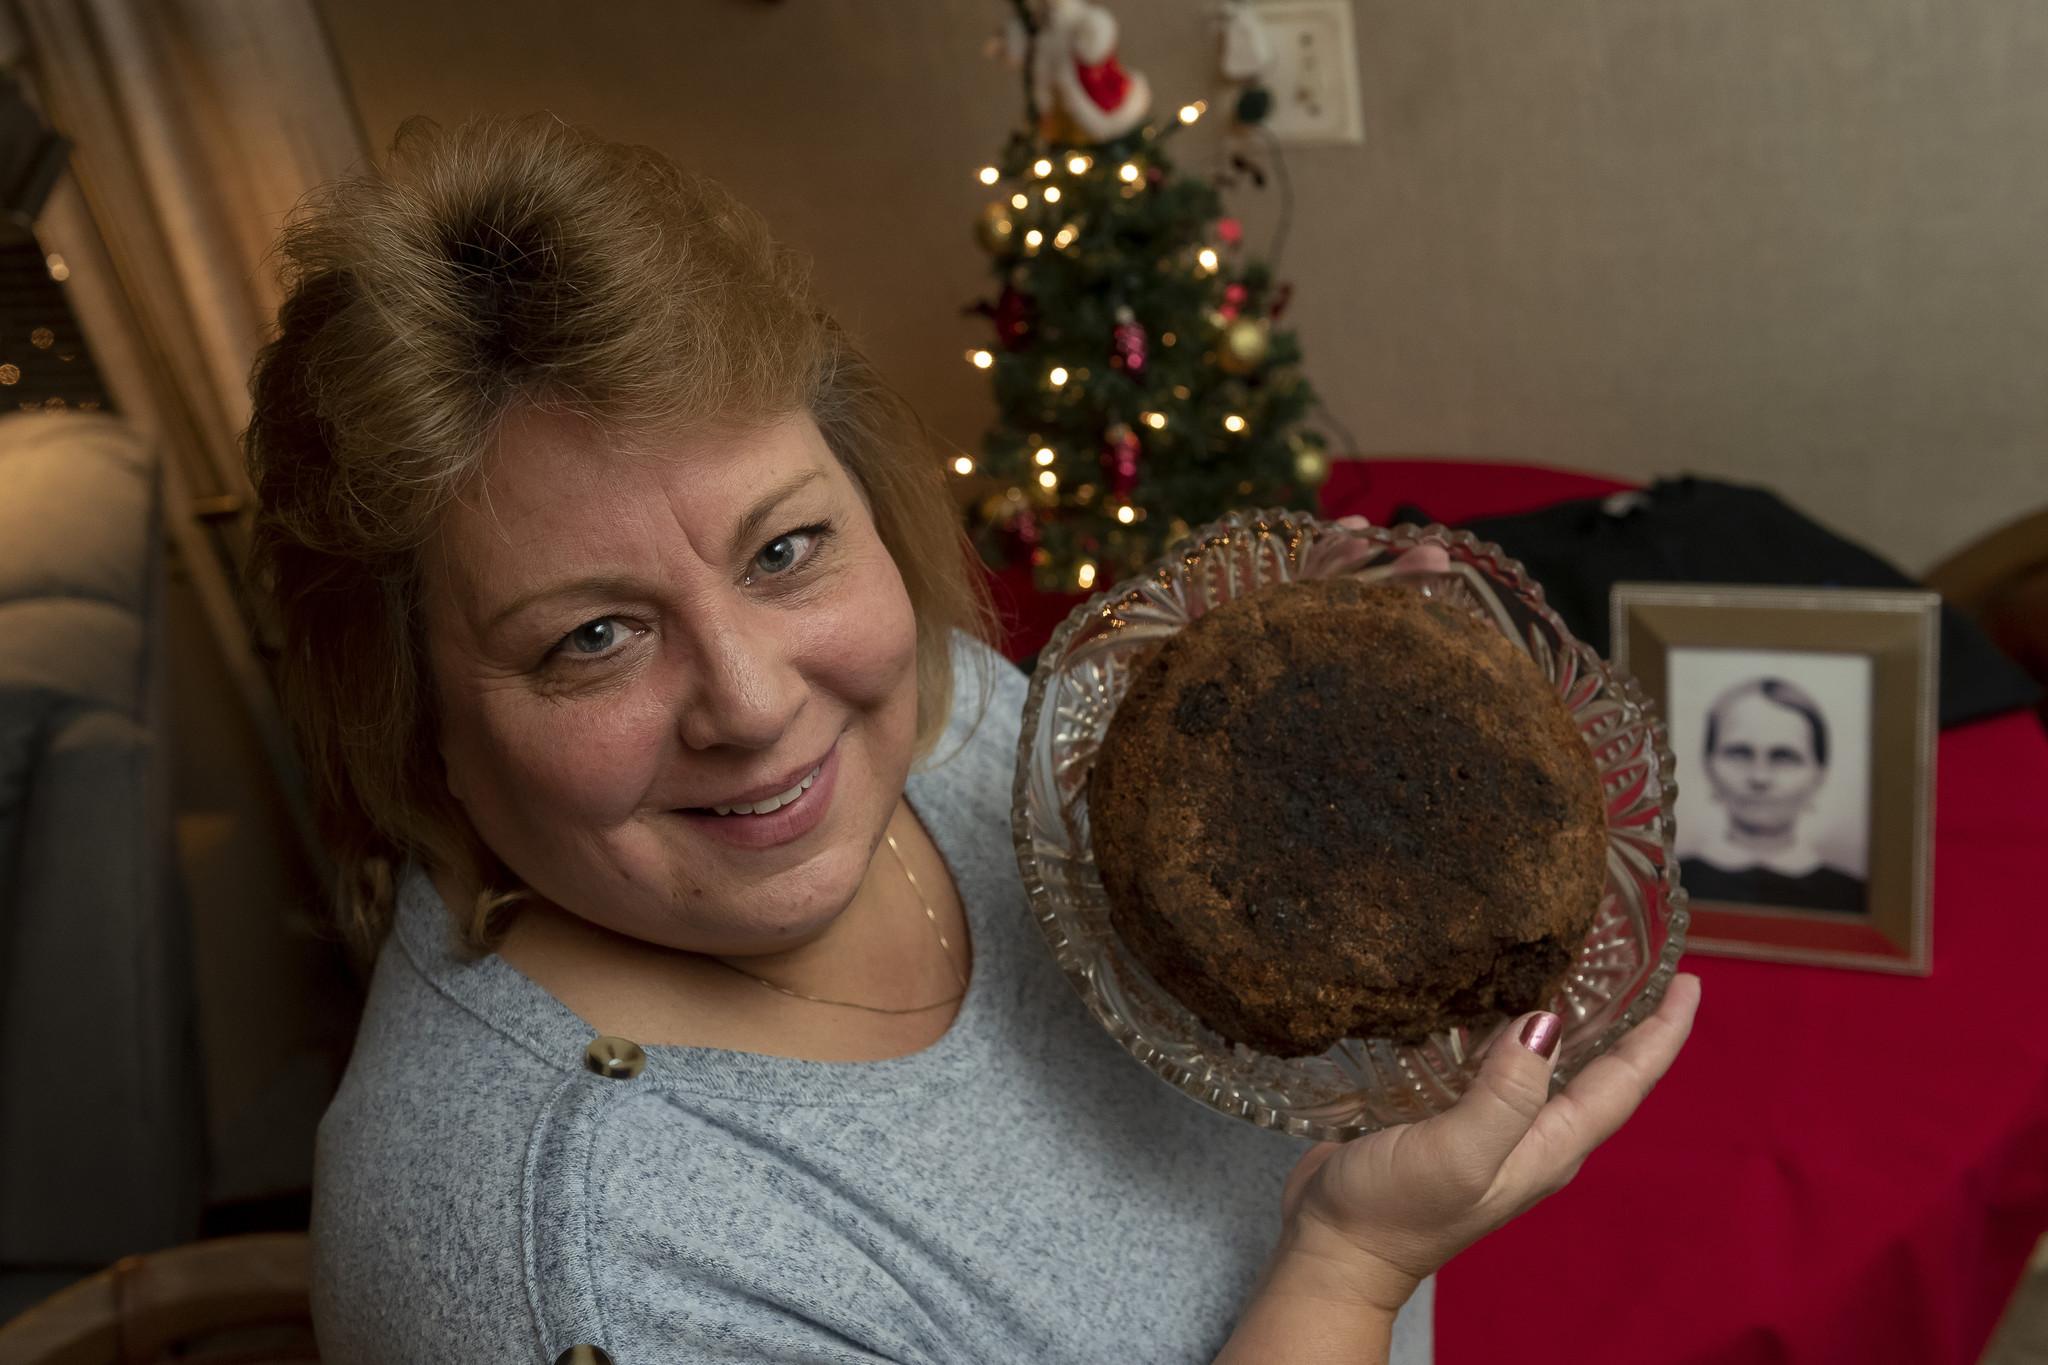 Michigan family to keep passing down 141-year-old fruitcake